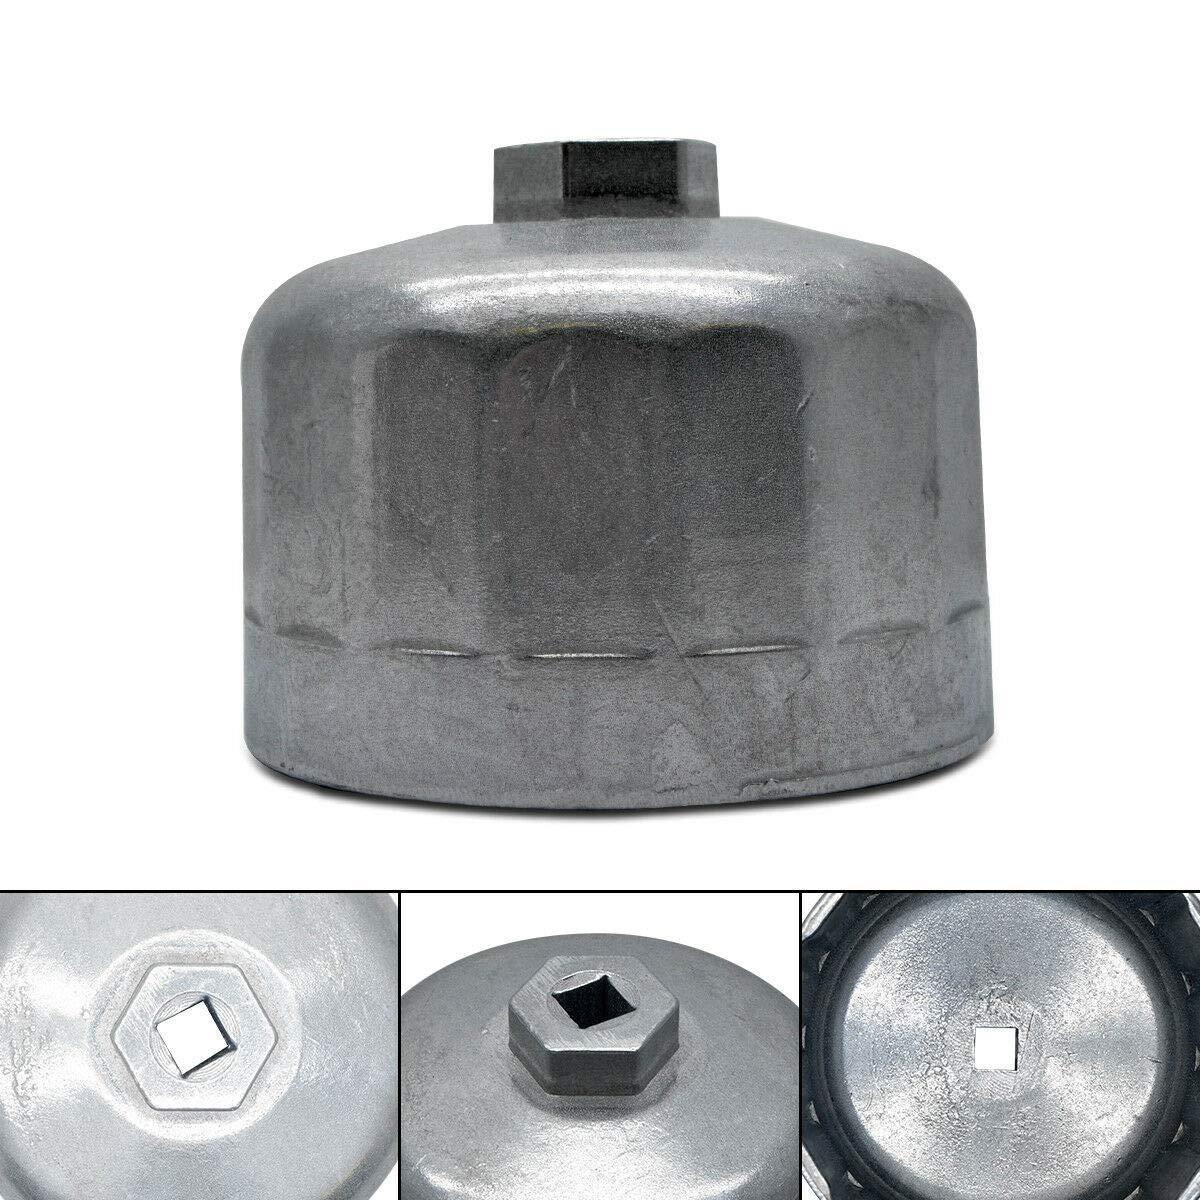 etc. 74 mm Maso Llave de Filtro de Aceite 14 Flautas para BMW Audi Benz de Aluminio